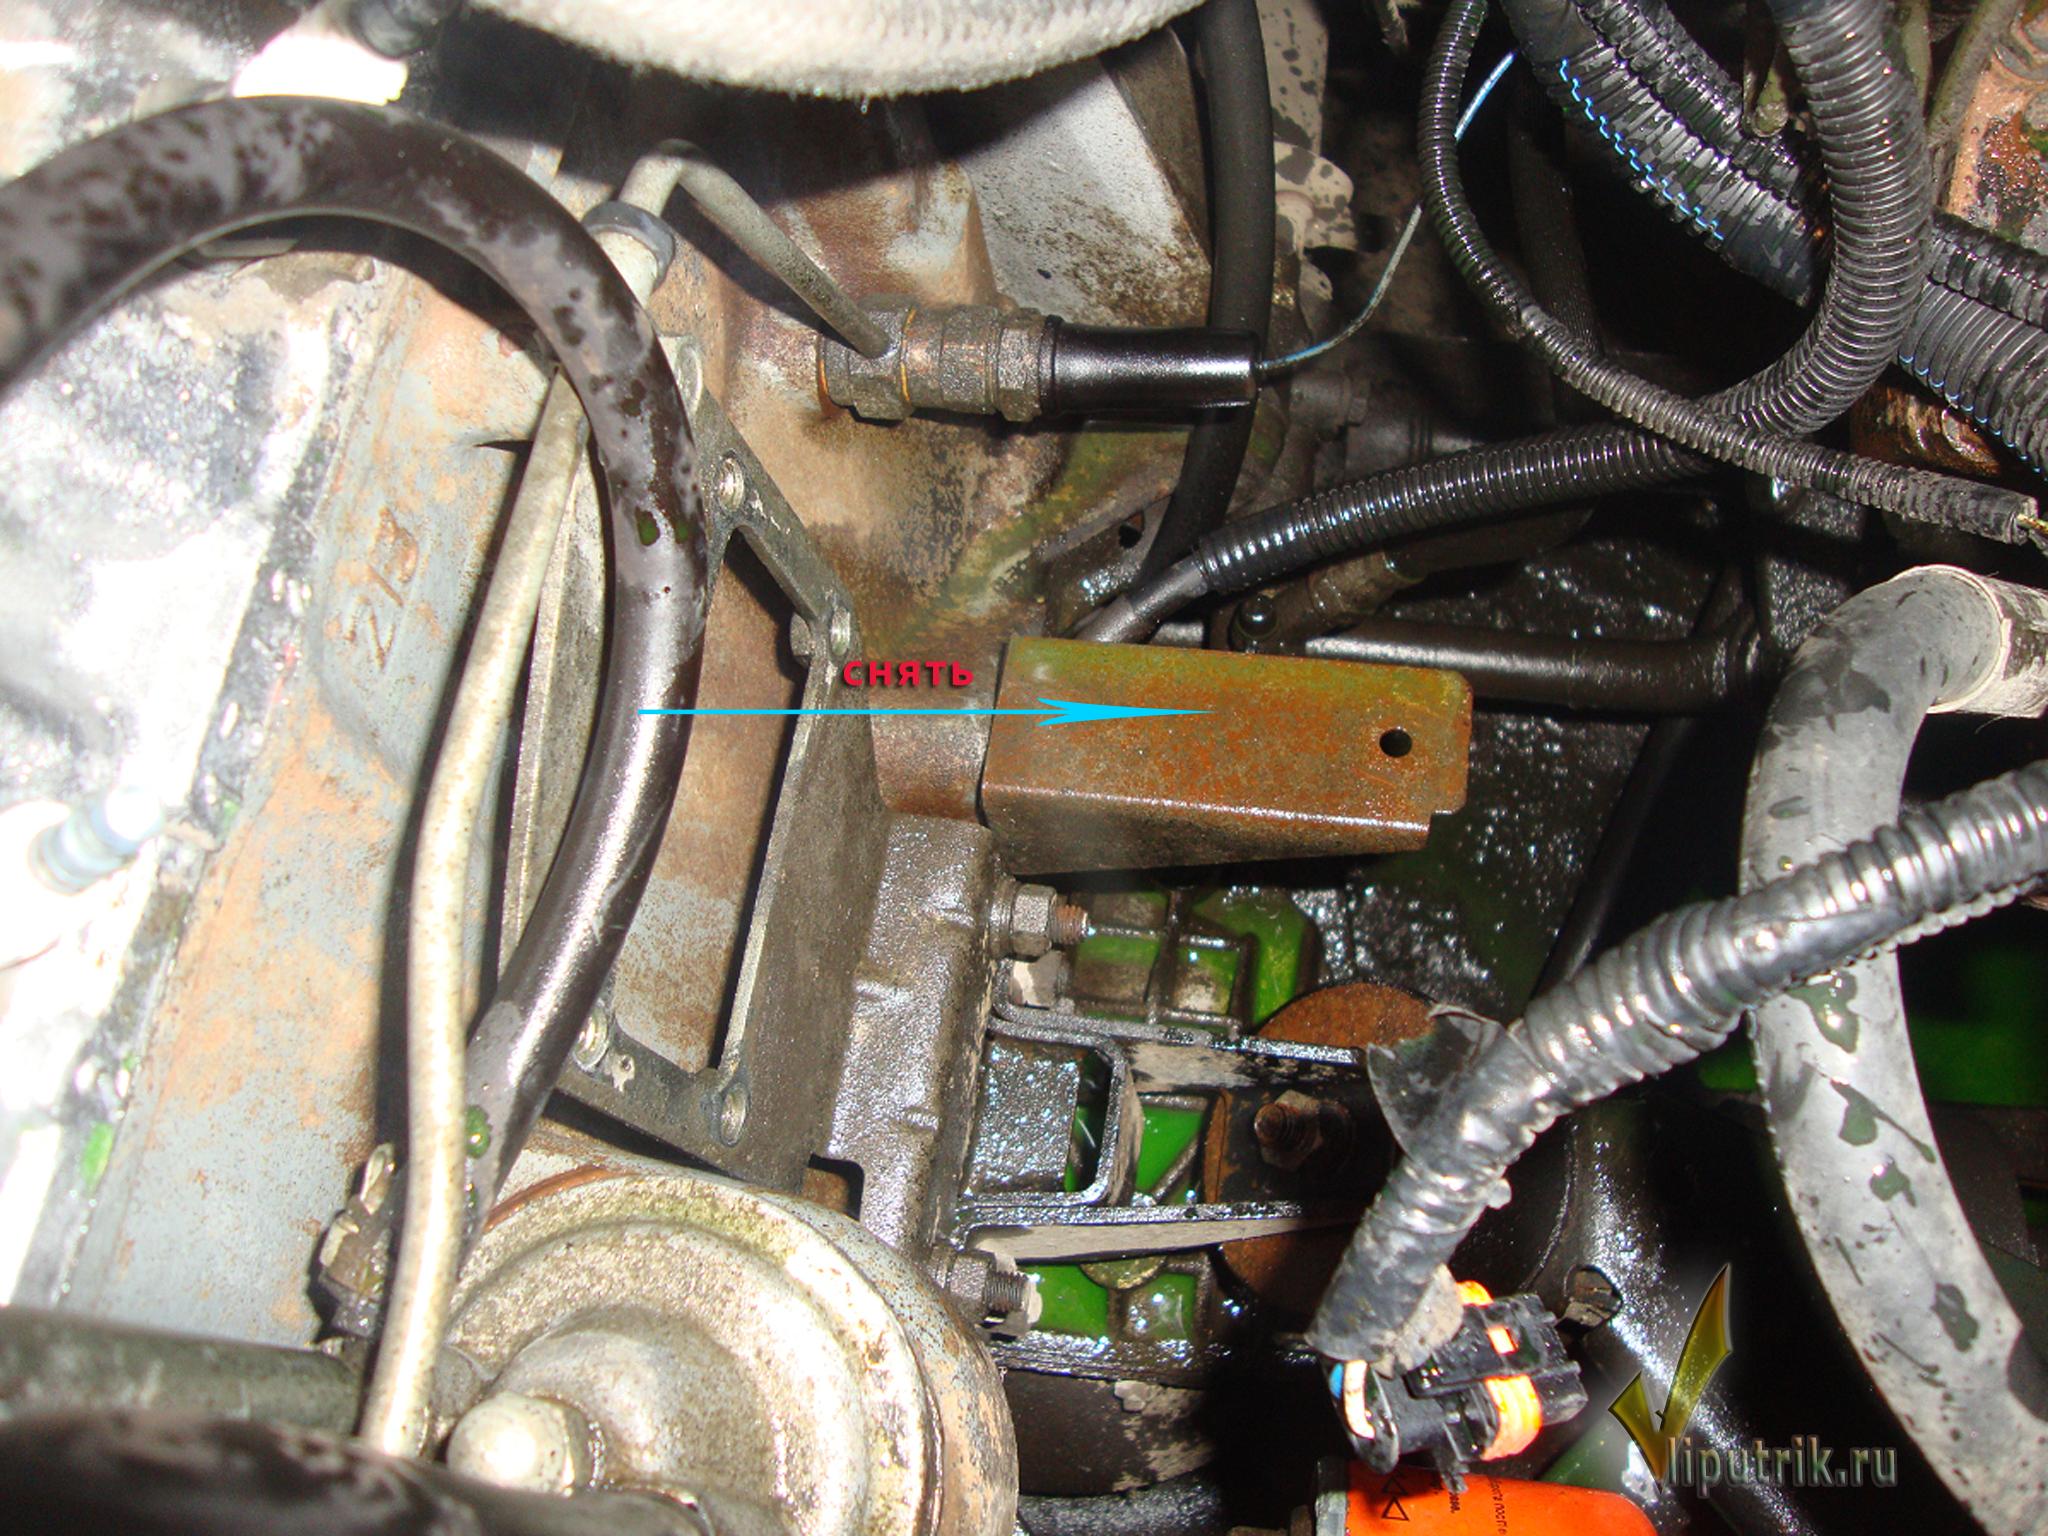 установка электроподогревателя hyundai hd68 северс-м